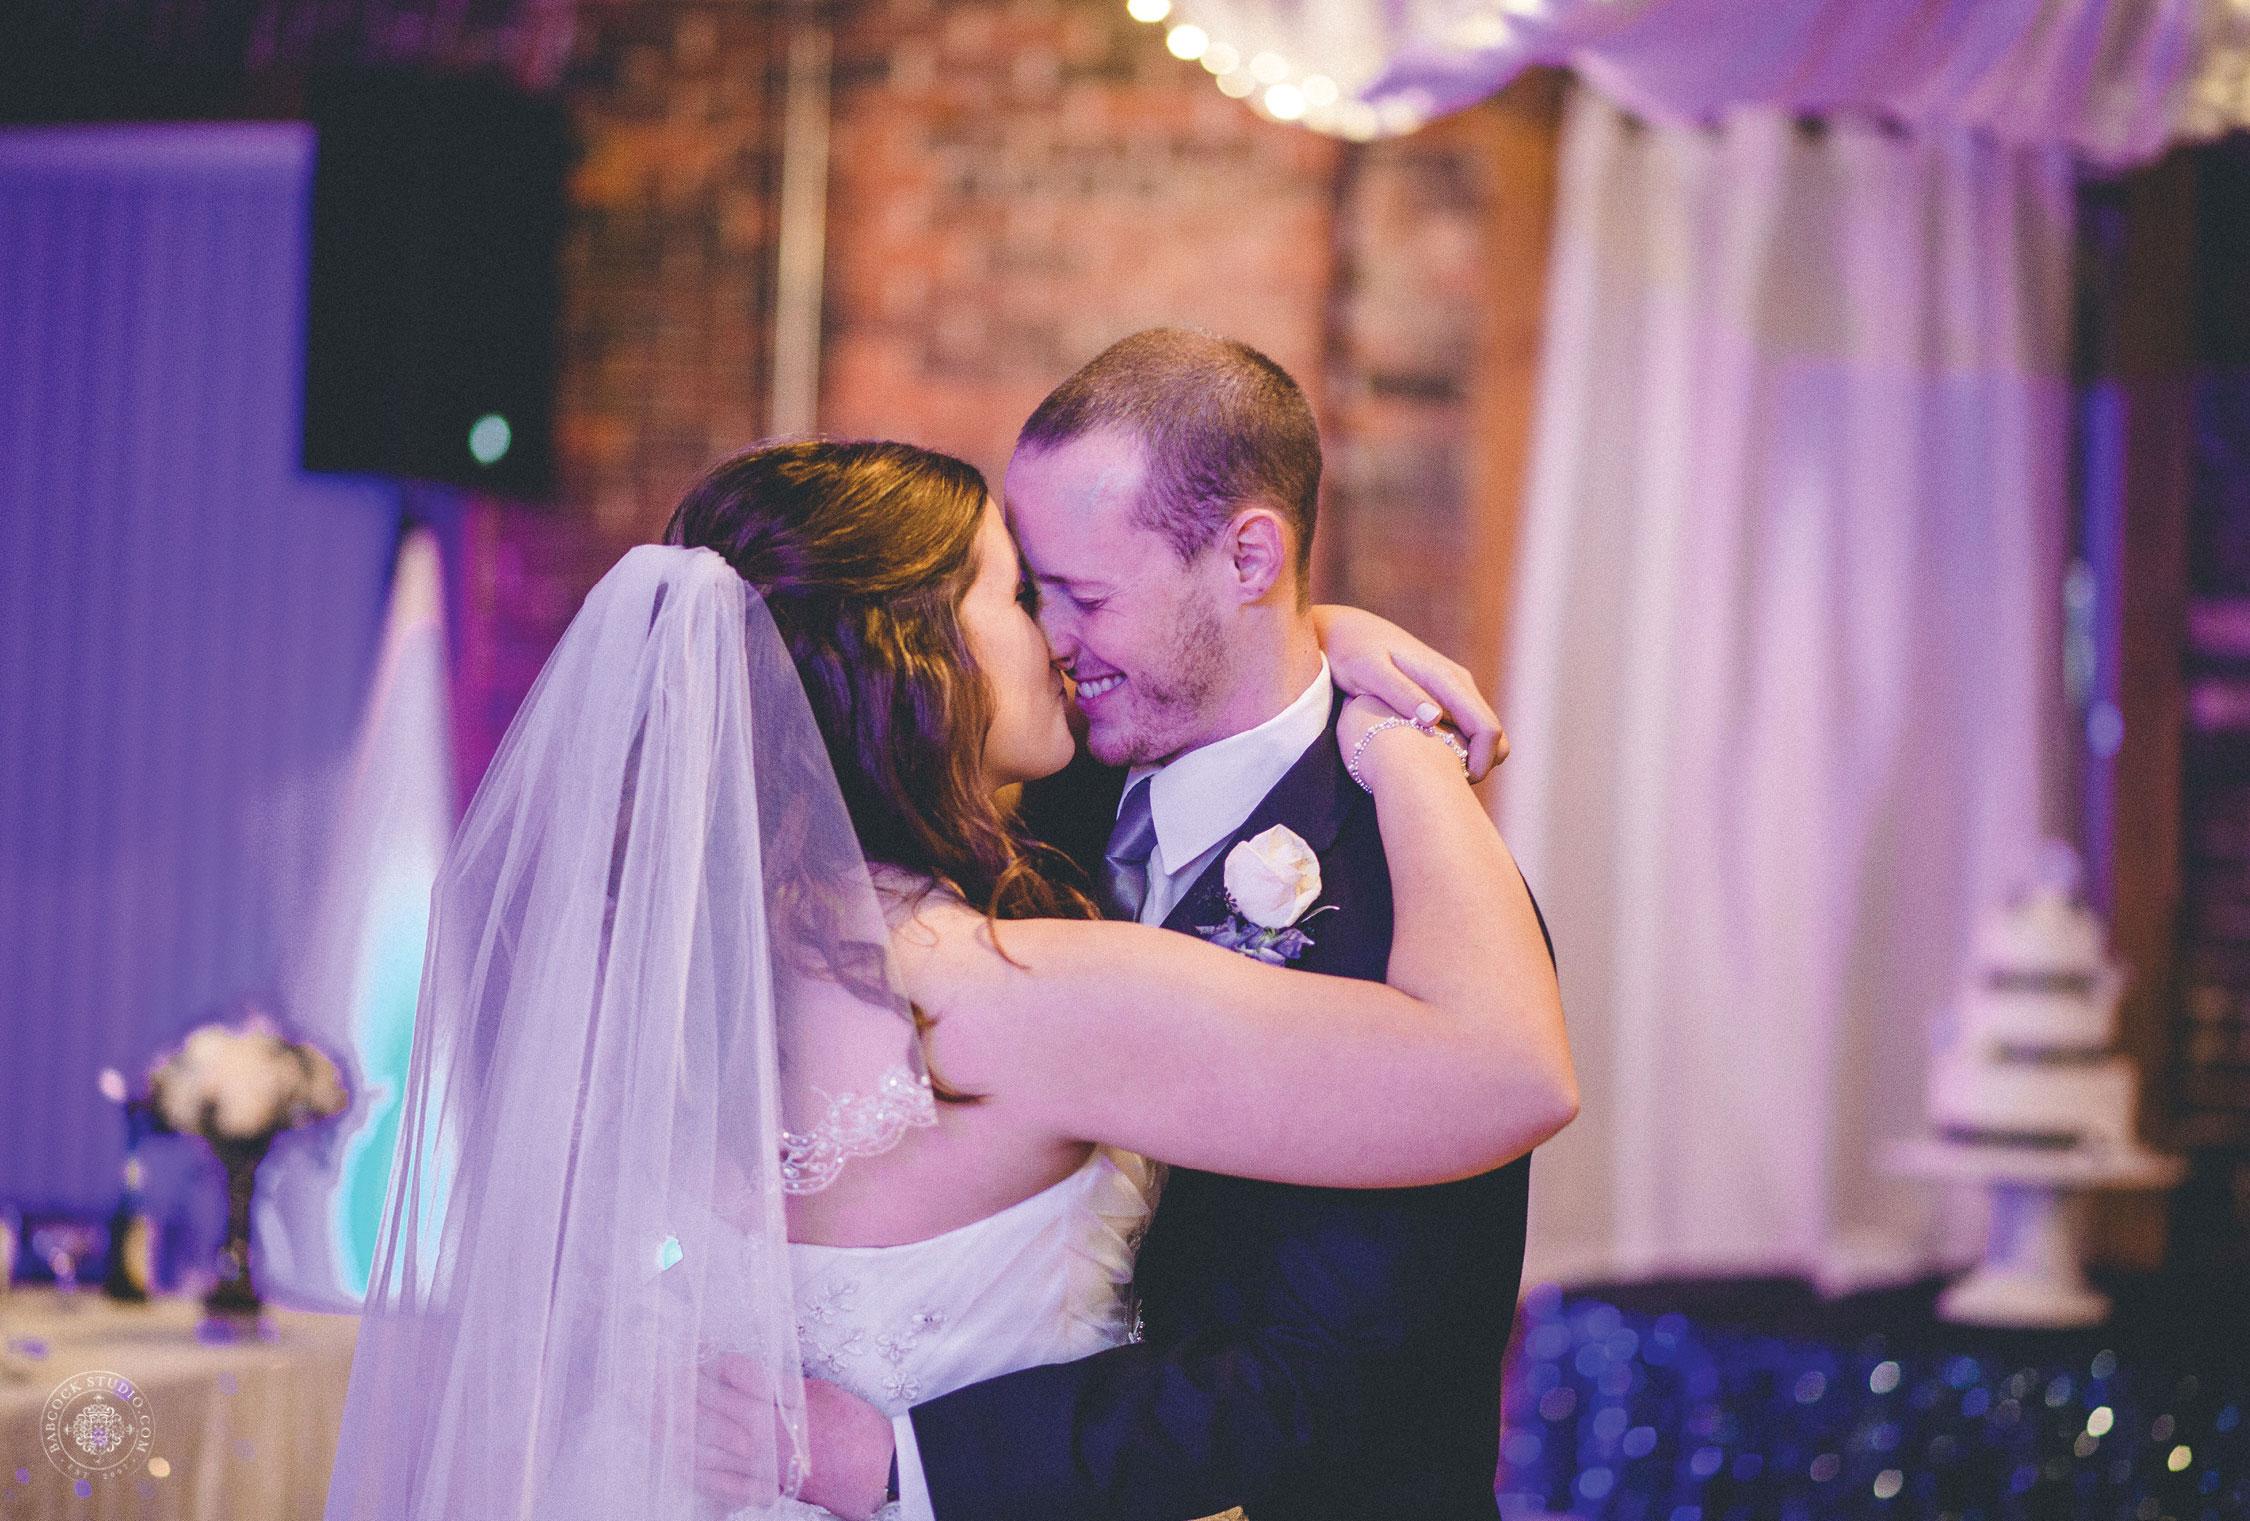 erica-nick-wedding-photographer-dayton-ohio-18.jpg